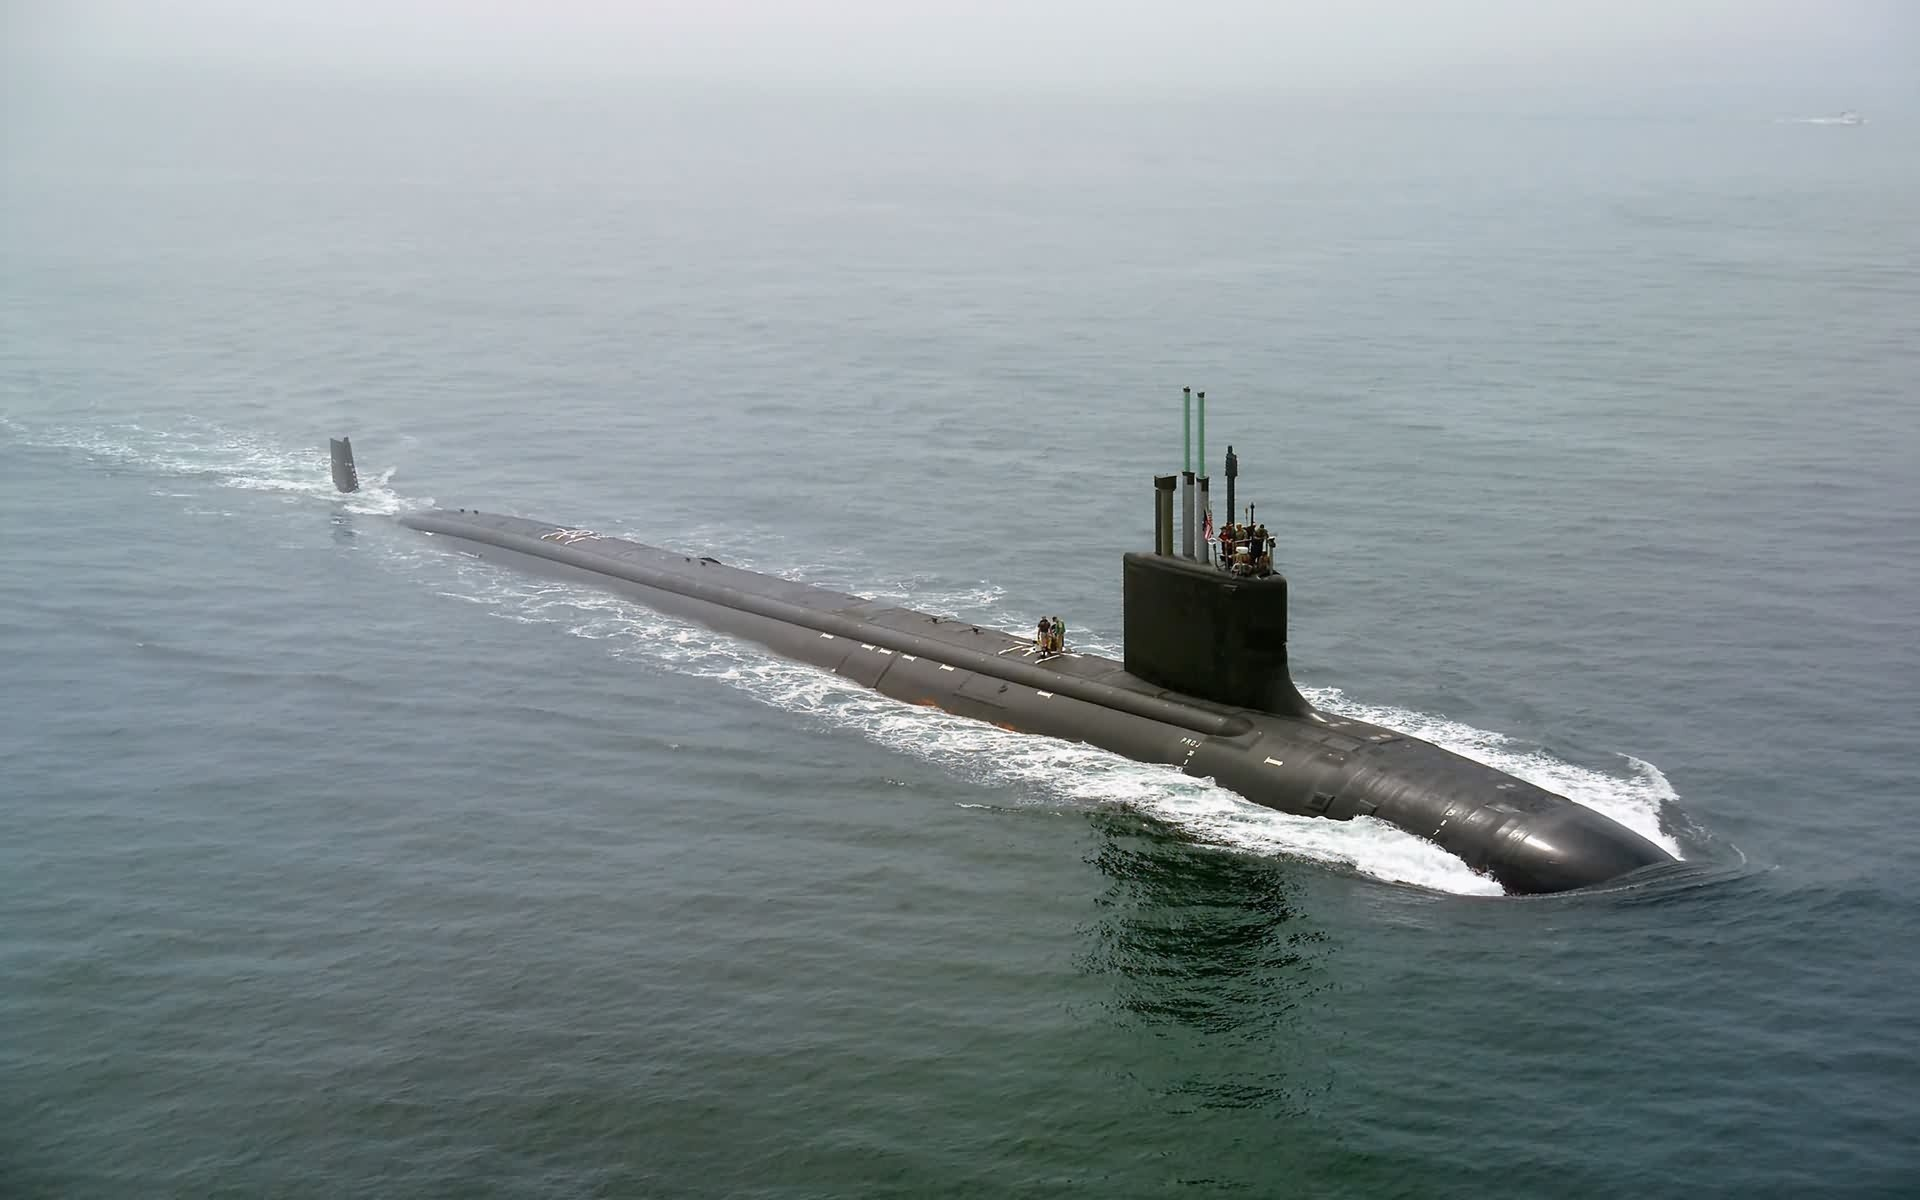 virginia class submarine hd wallpaper | hintergrund